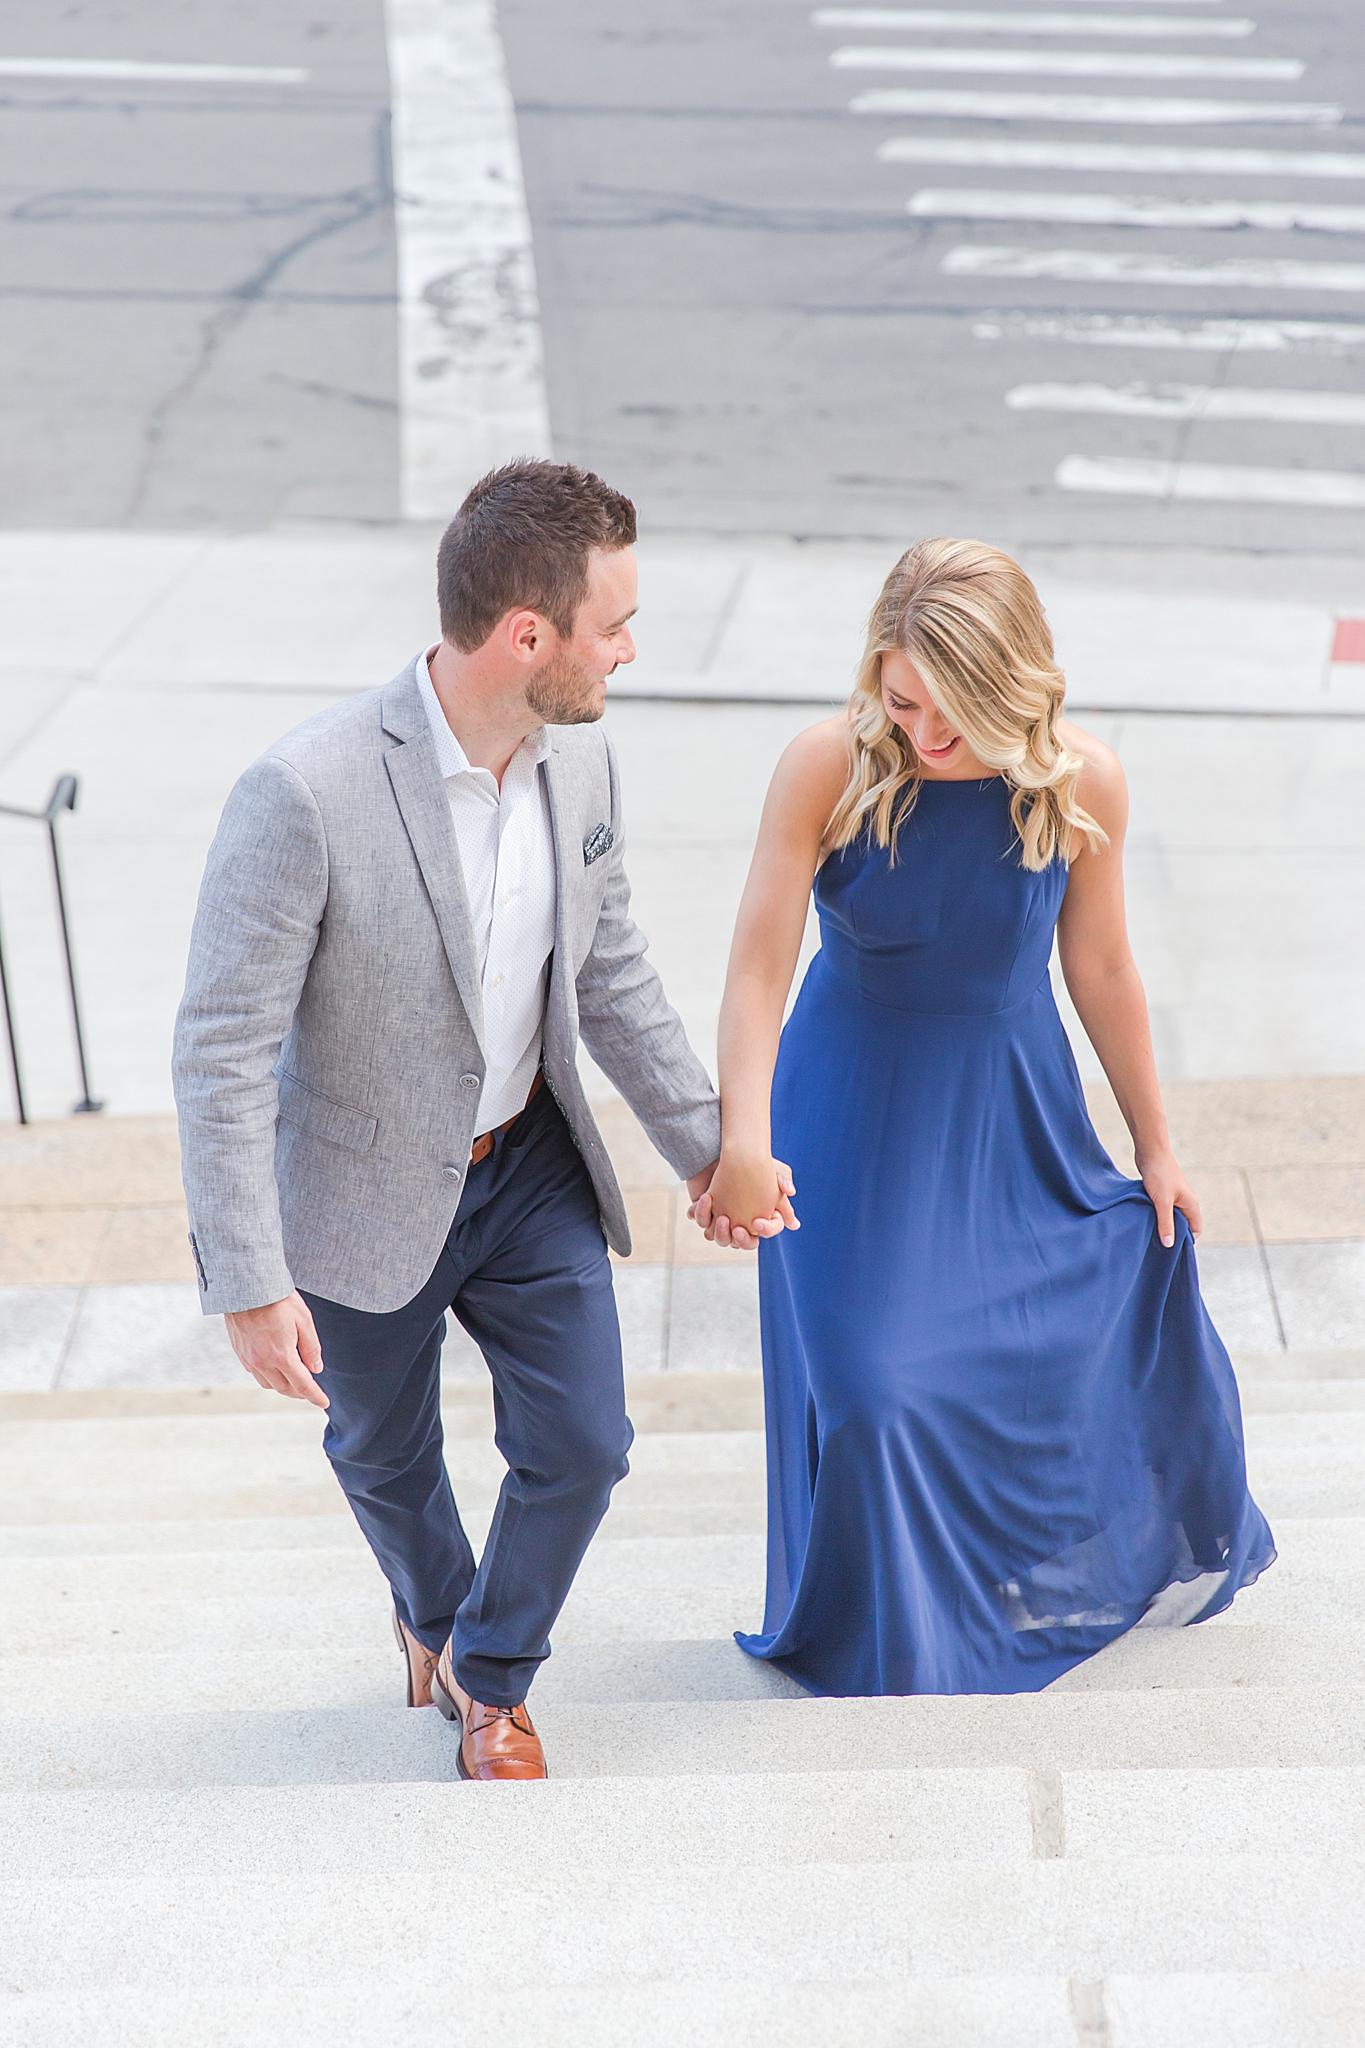 detroit-wedding-photographer-downtown-detroit-belle-isle-engagement-photos-sarah-eric-by-courtney-carolyn-photography_0021.jpg